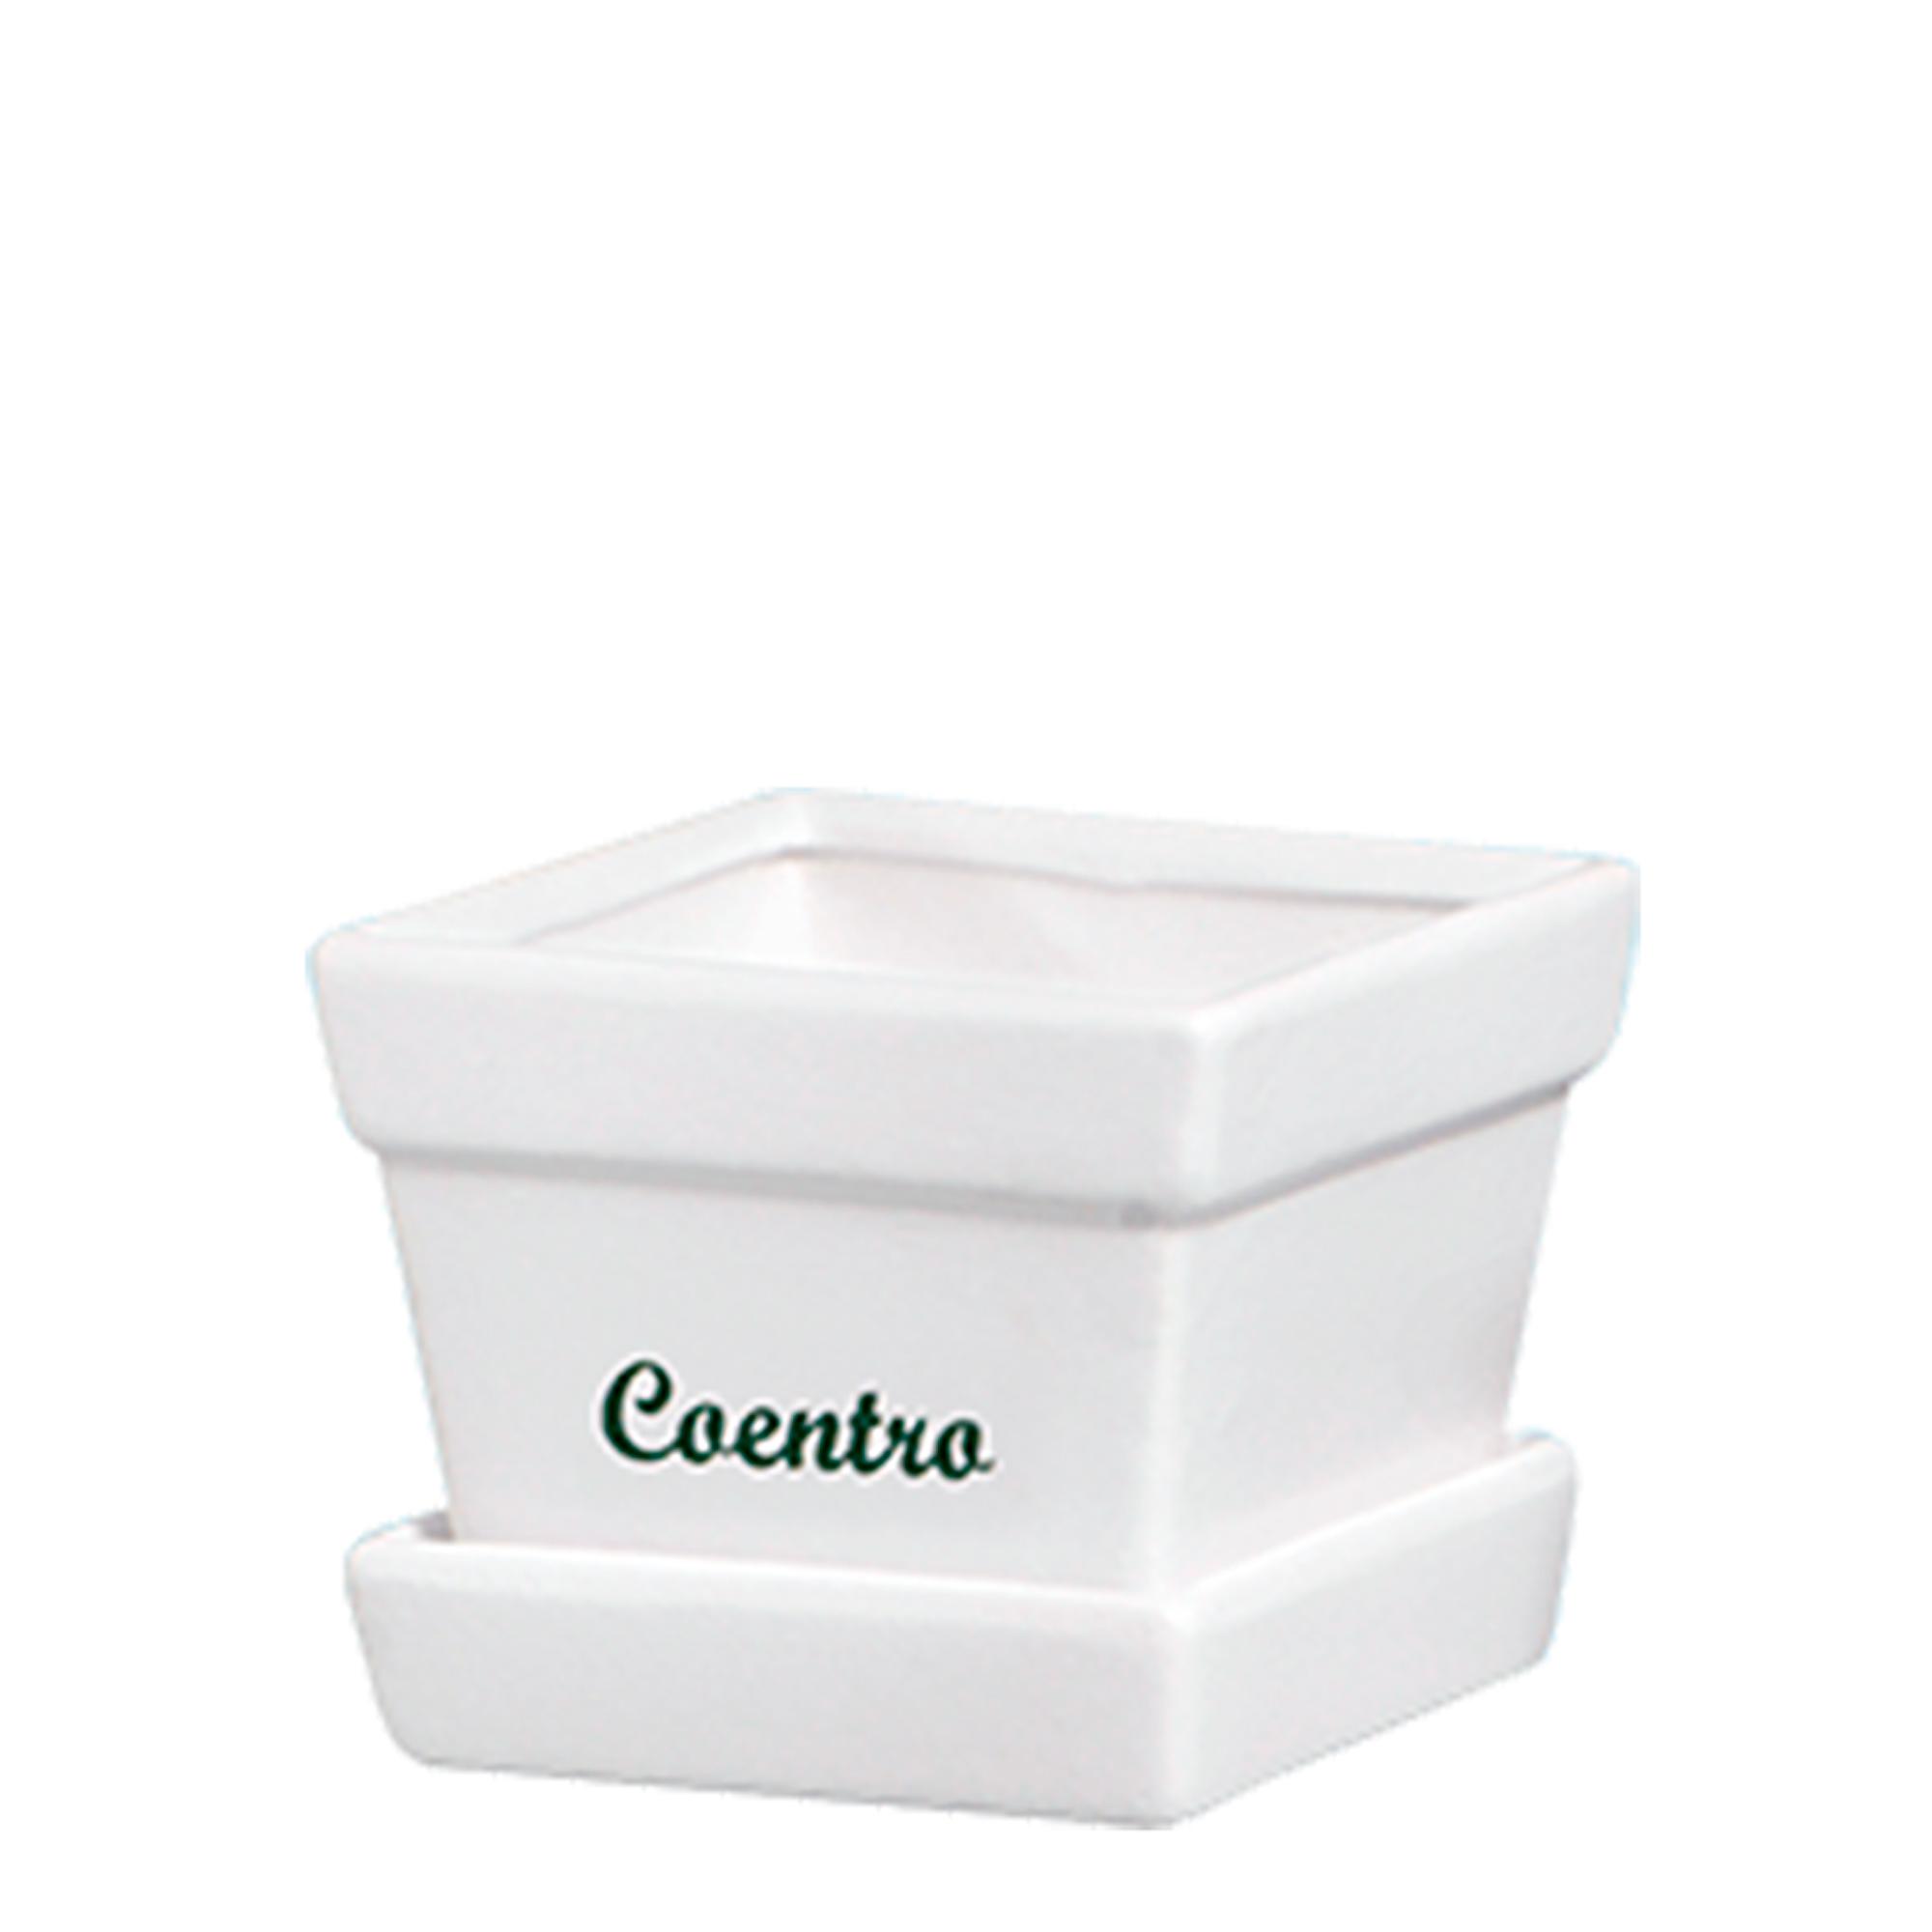 Cachepo n°1 c/ Prato Coentro